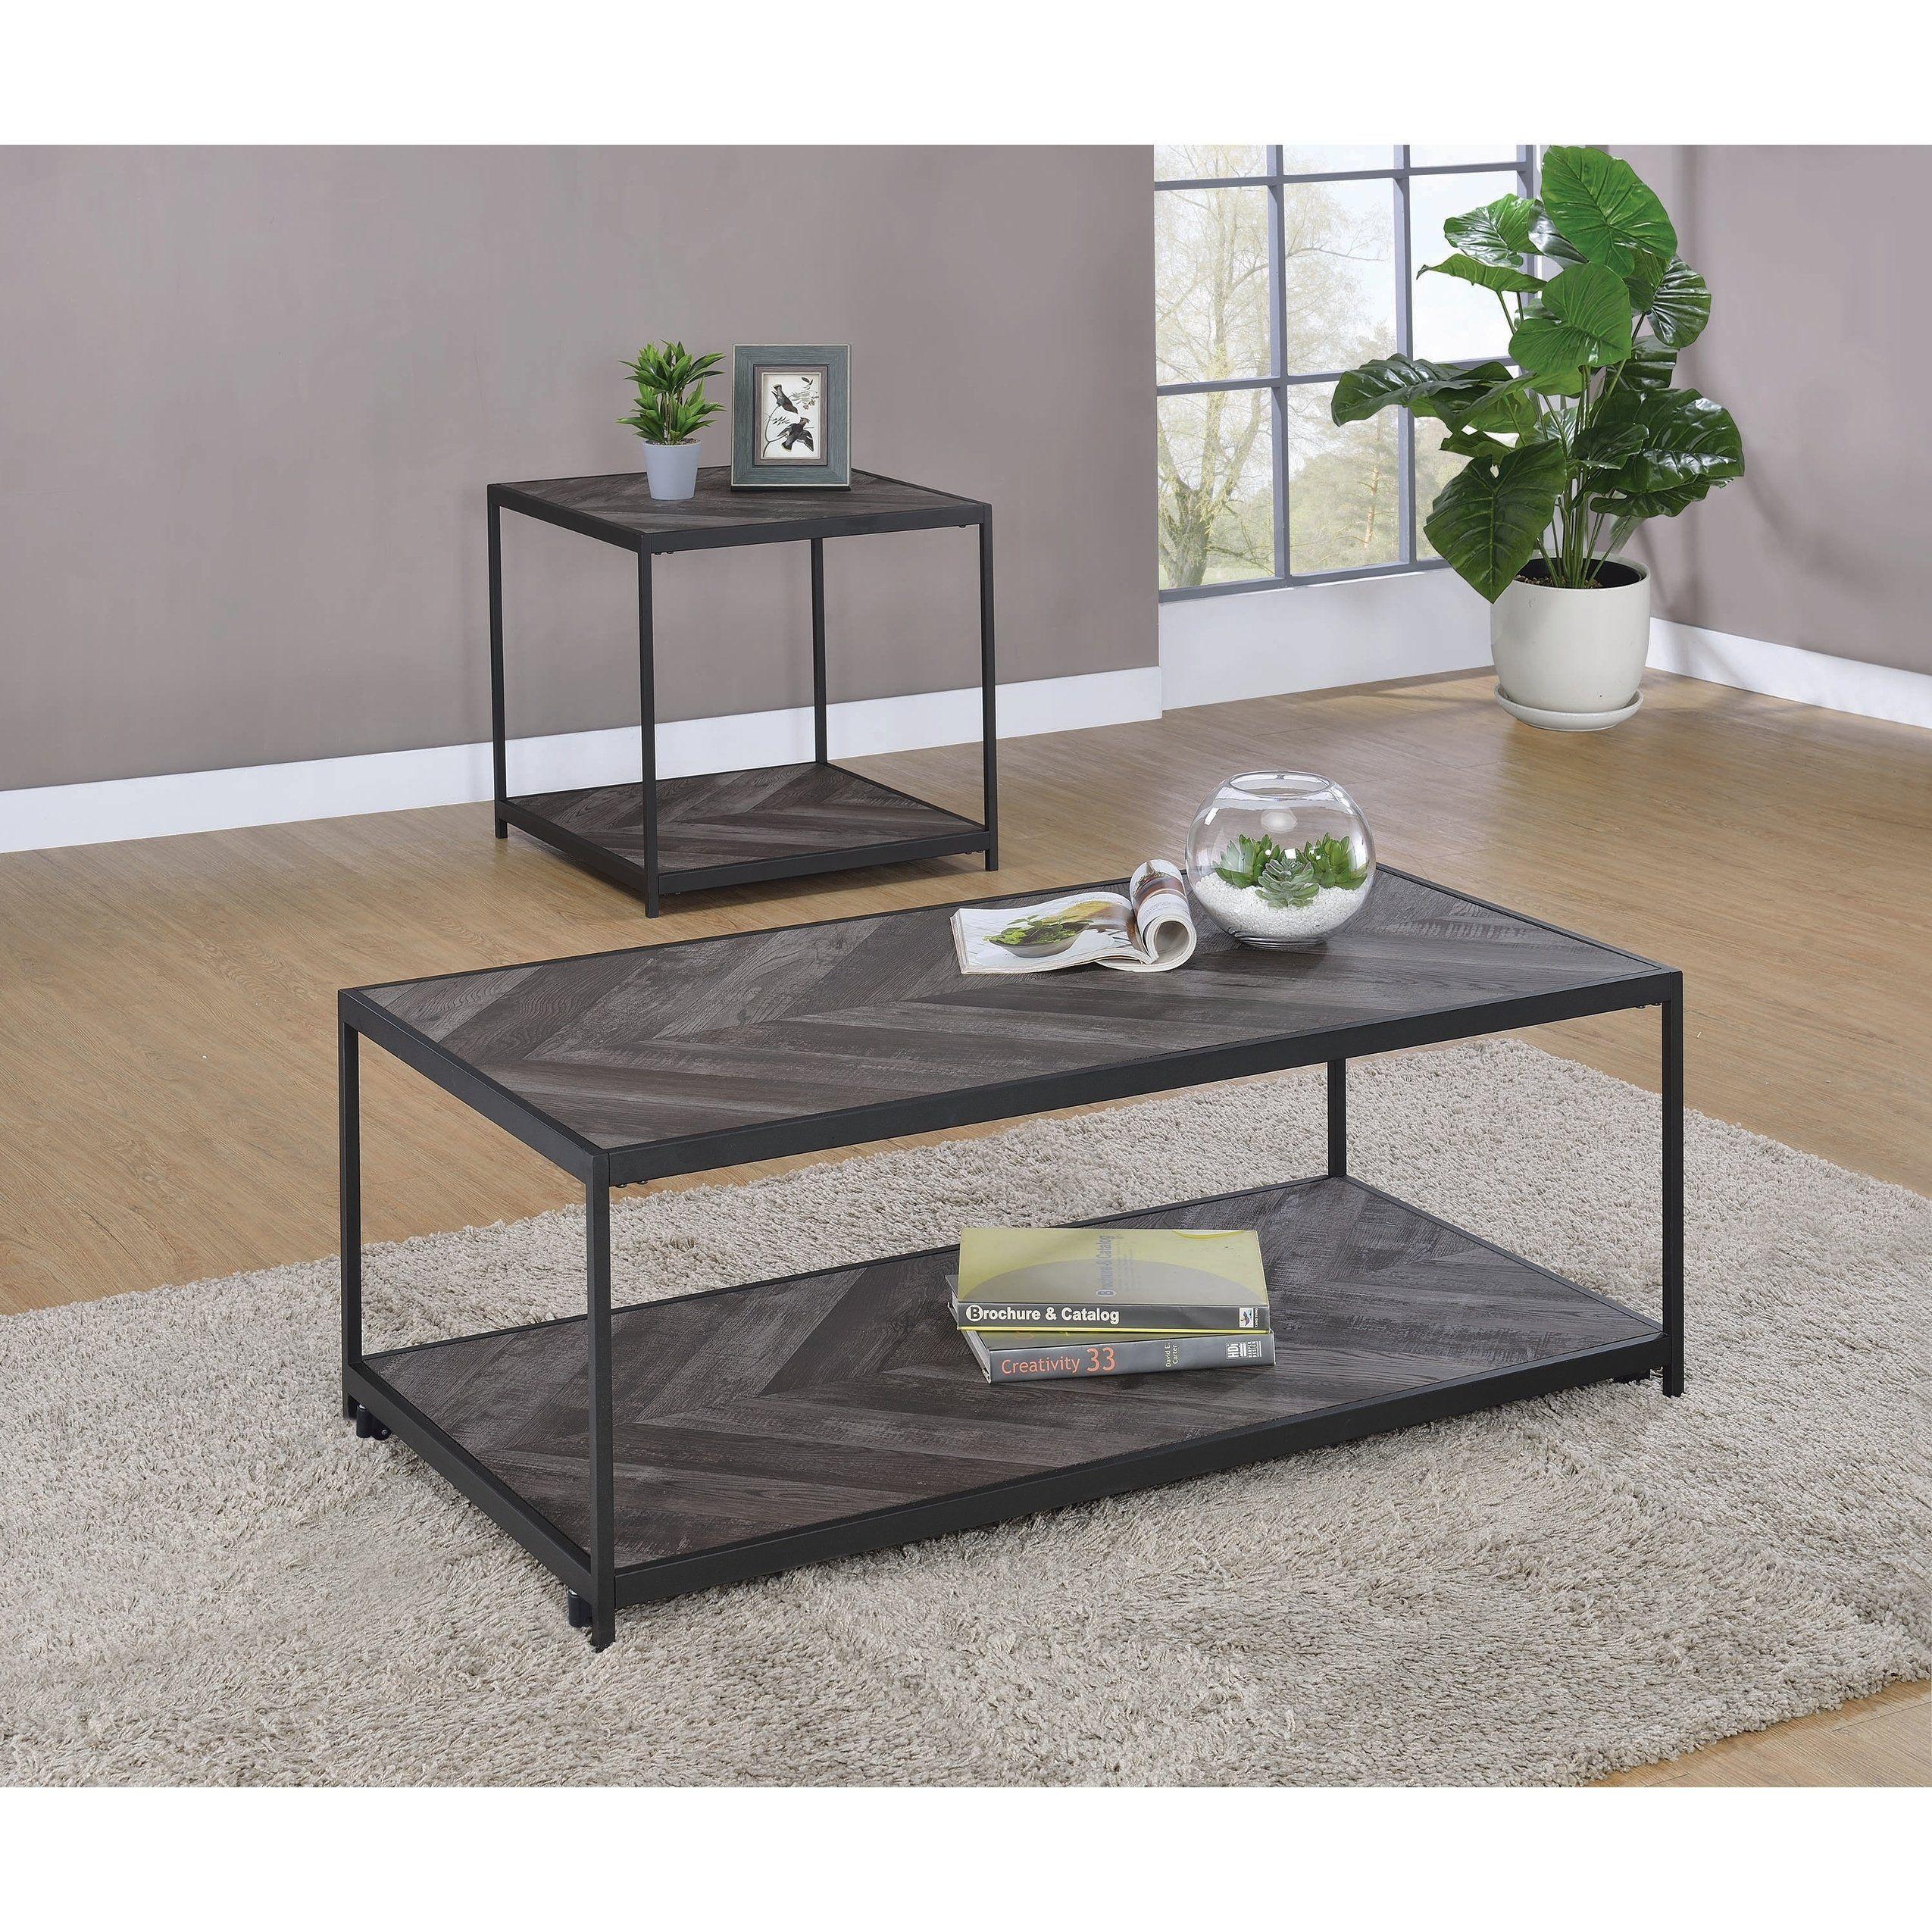 Rustic Grey Herringbone Square End Table Black Coffee Table Living Room Table Sets Living Room Table [ 2550 x 2550 Pixel ]